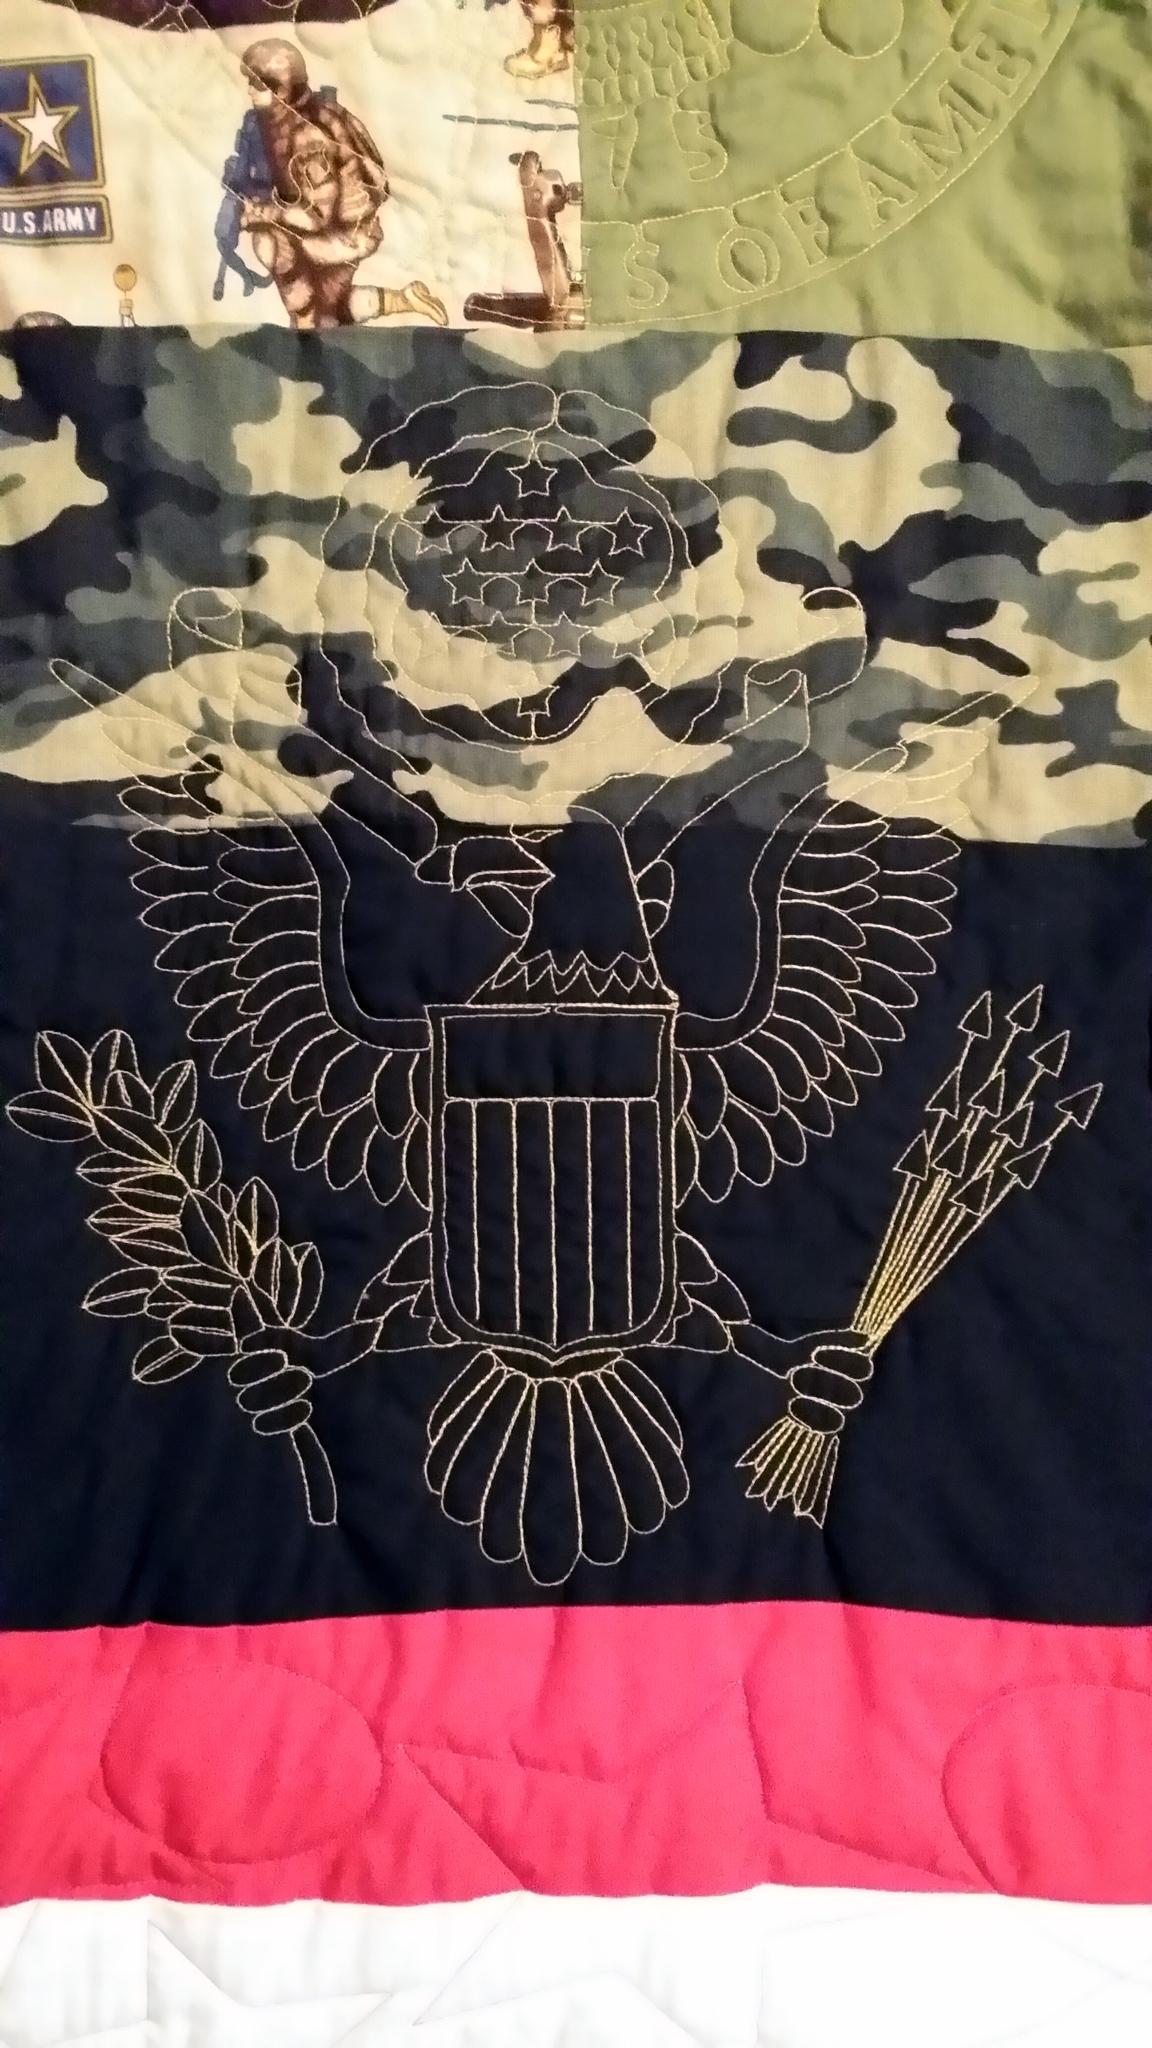 Design on Military Quilt